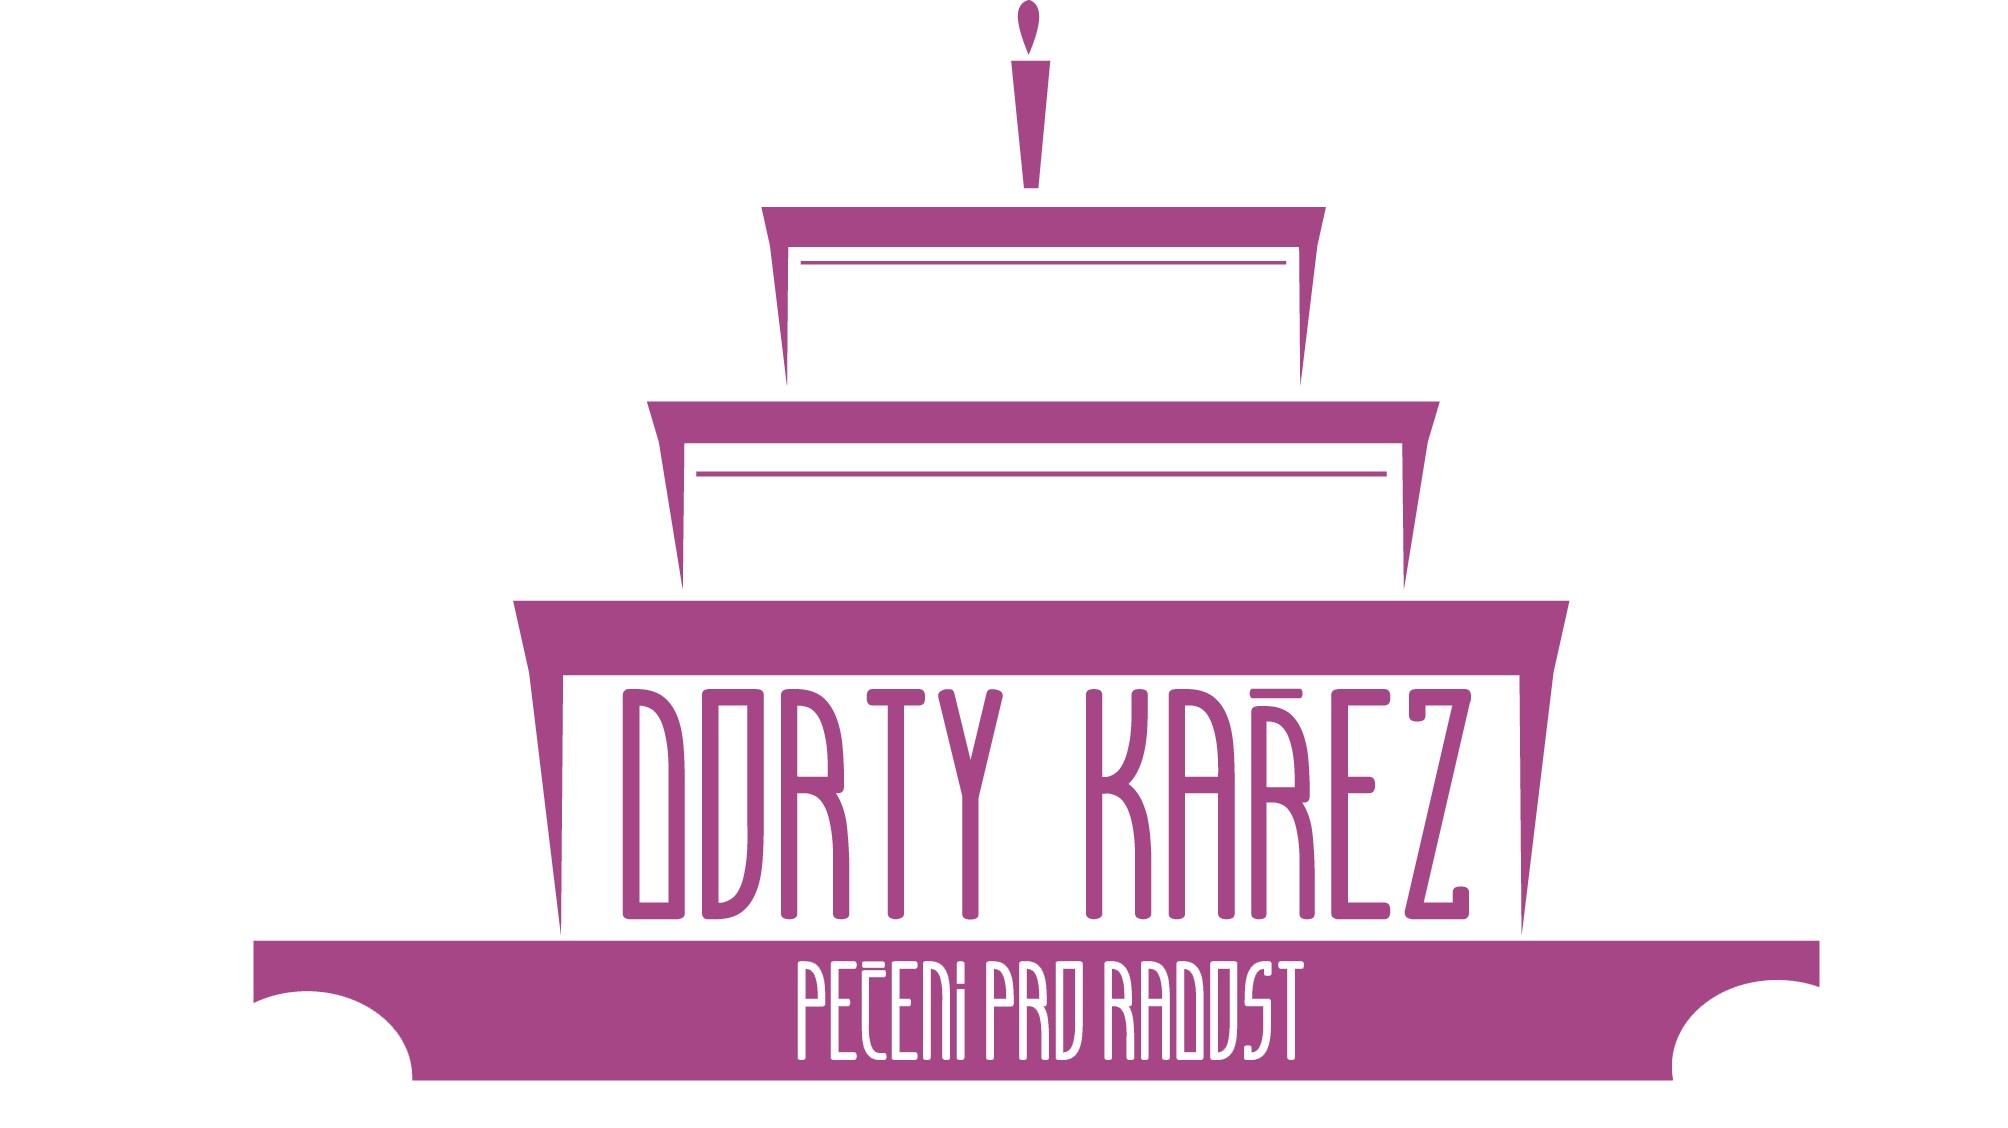 Dorty Kařez – Bc. Lenka Budínová